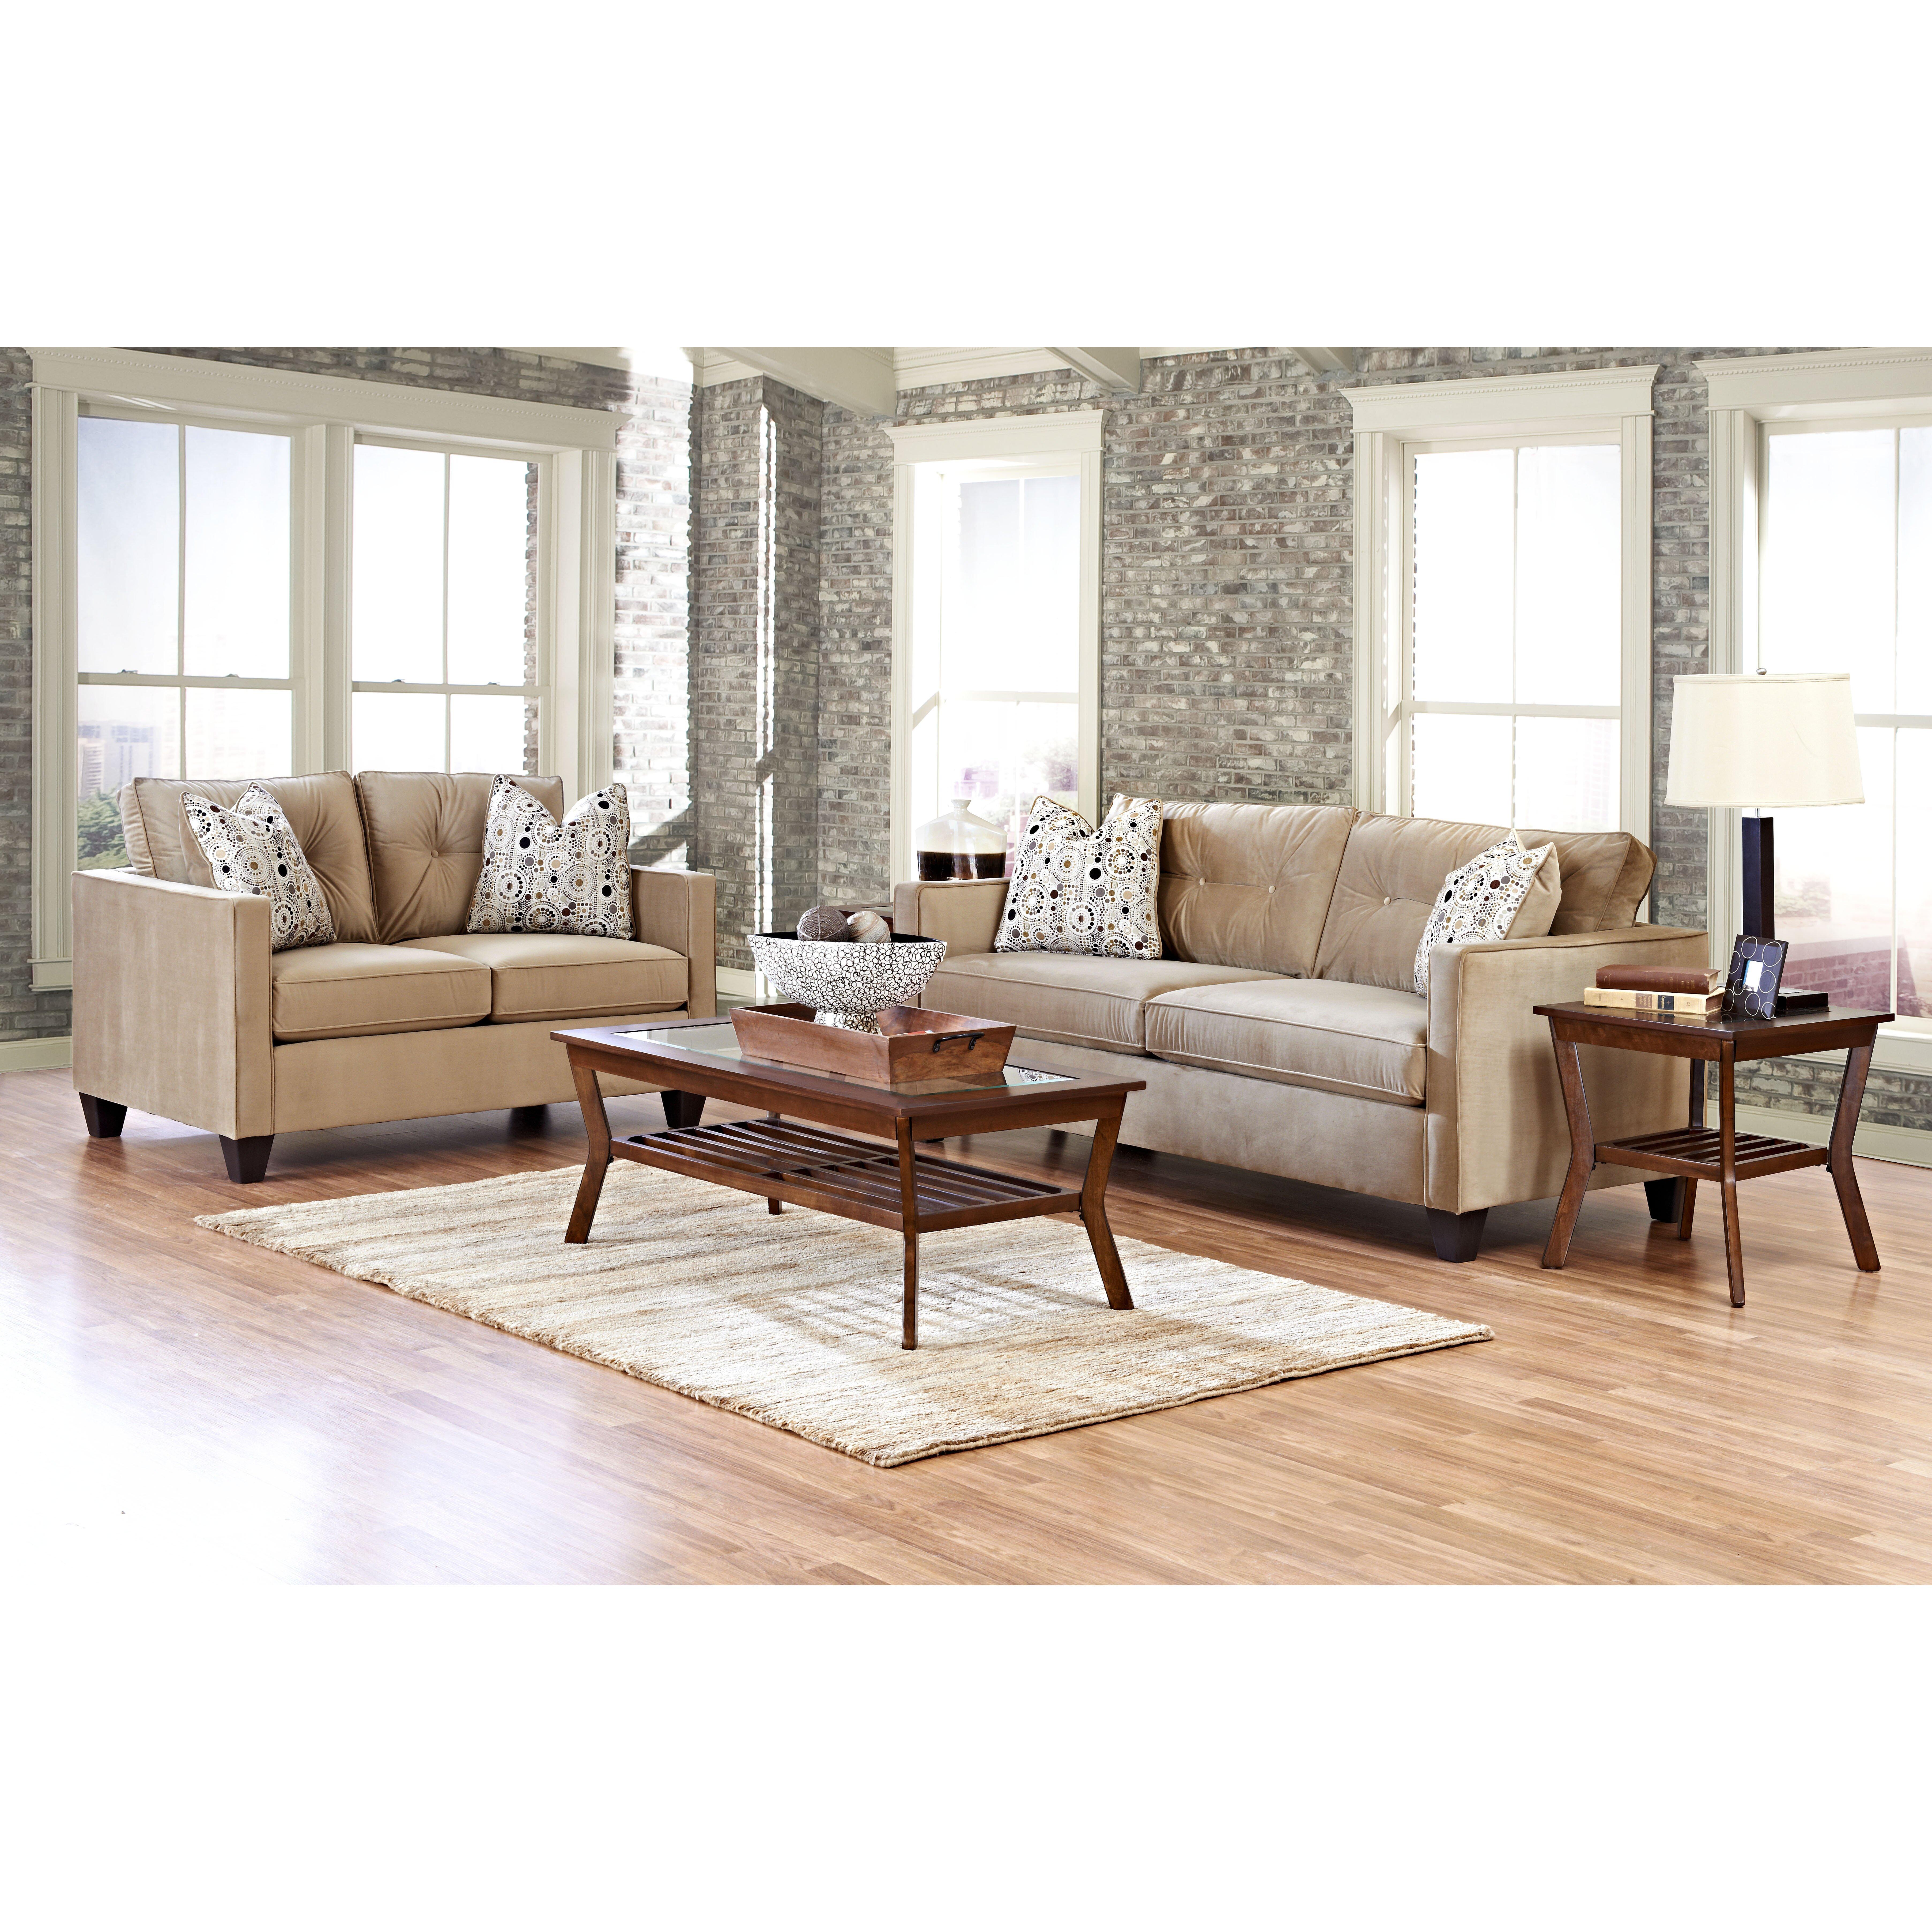 Wayfair Living Room Furniture Klaussner Furniture Derry Living Room Collection Reviews Wayfair